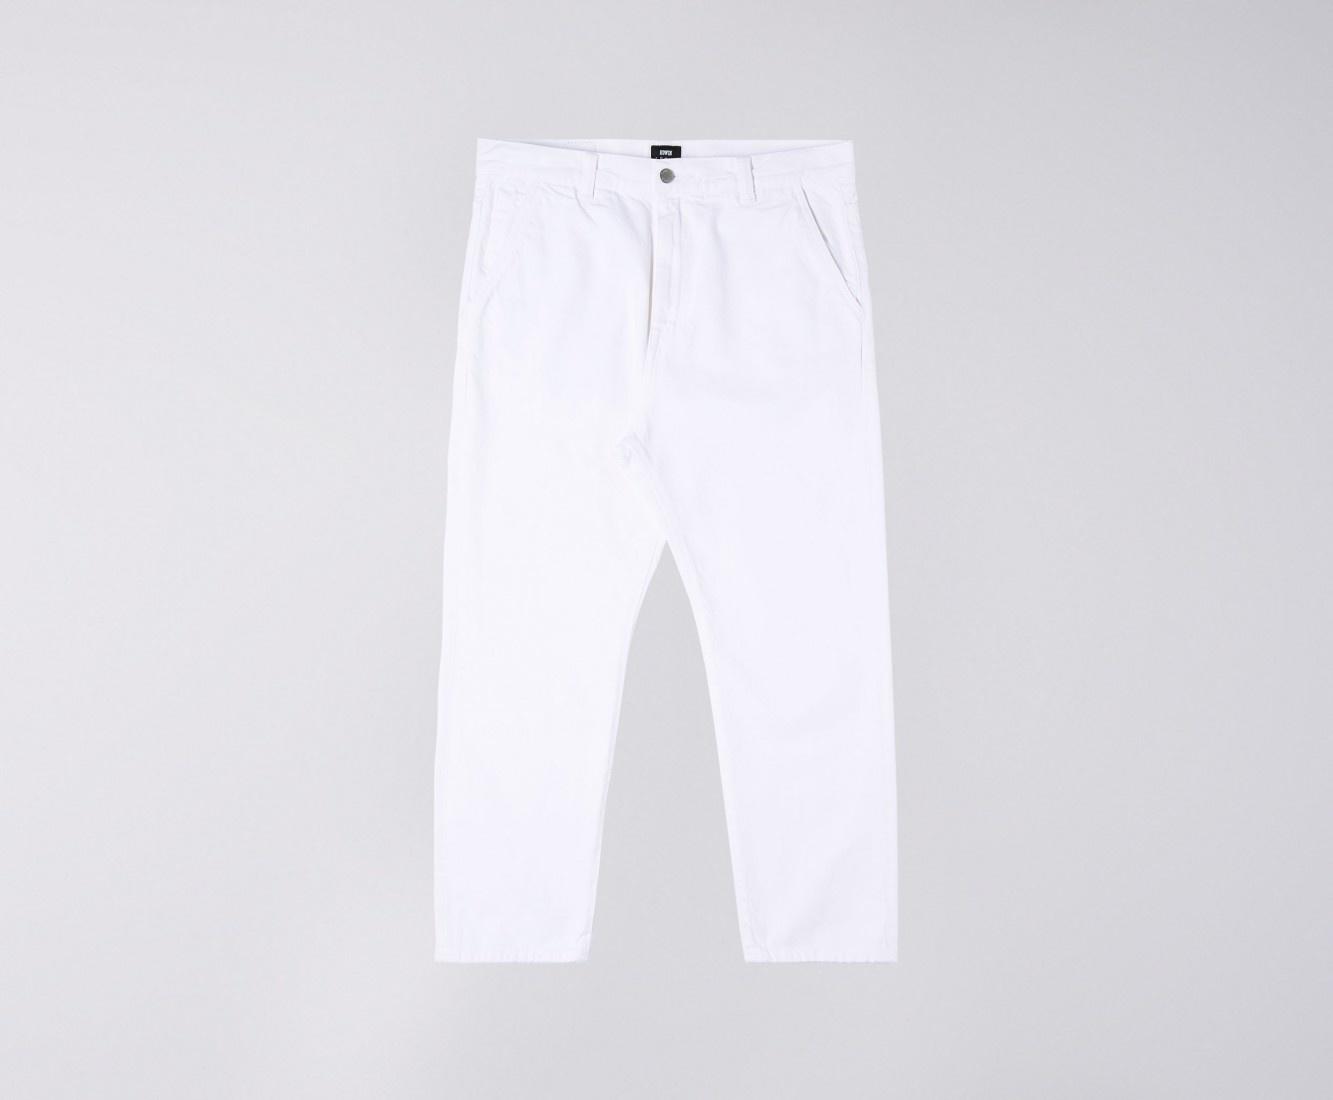 Universe Pant 12.5oz White Thorn Cotton-1